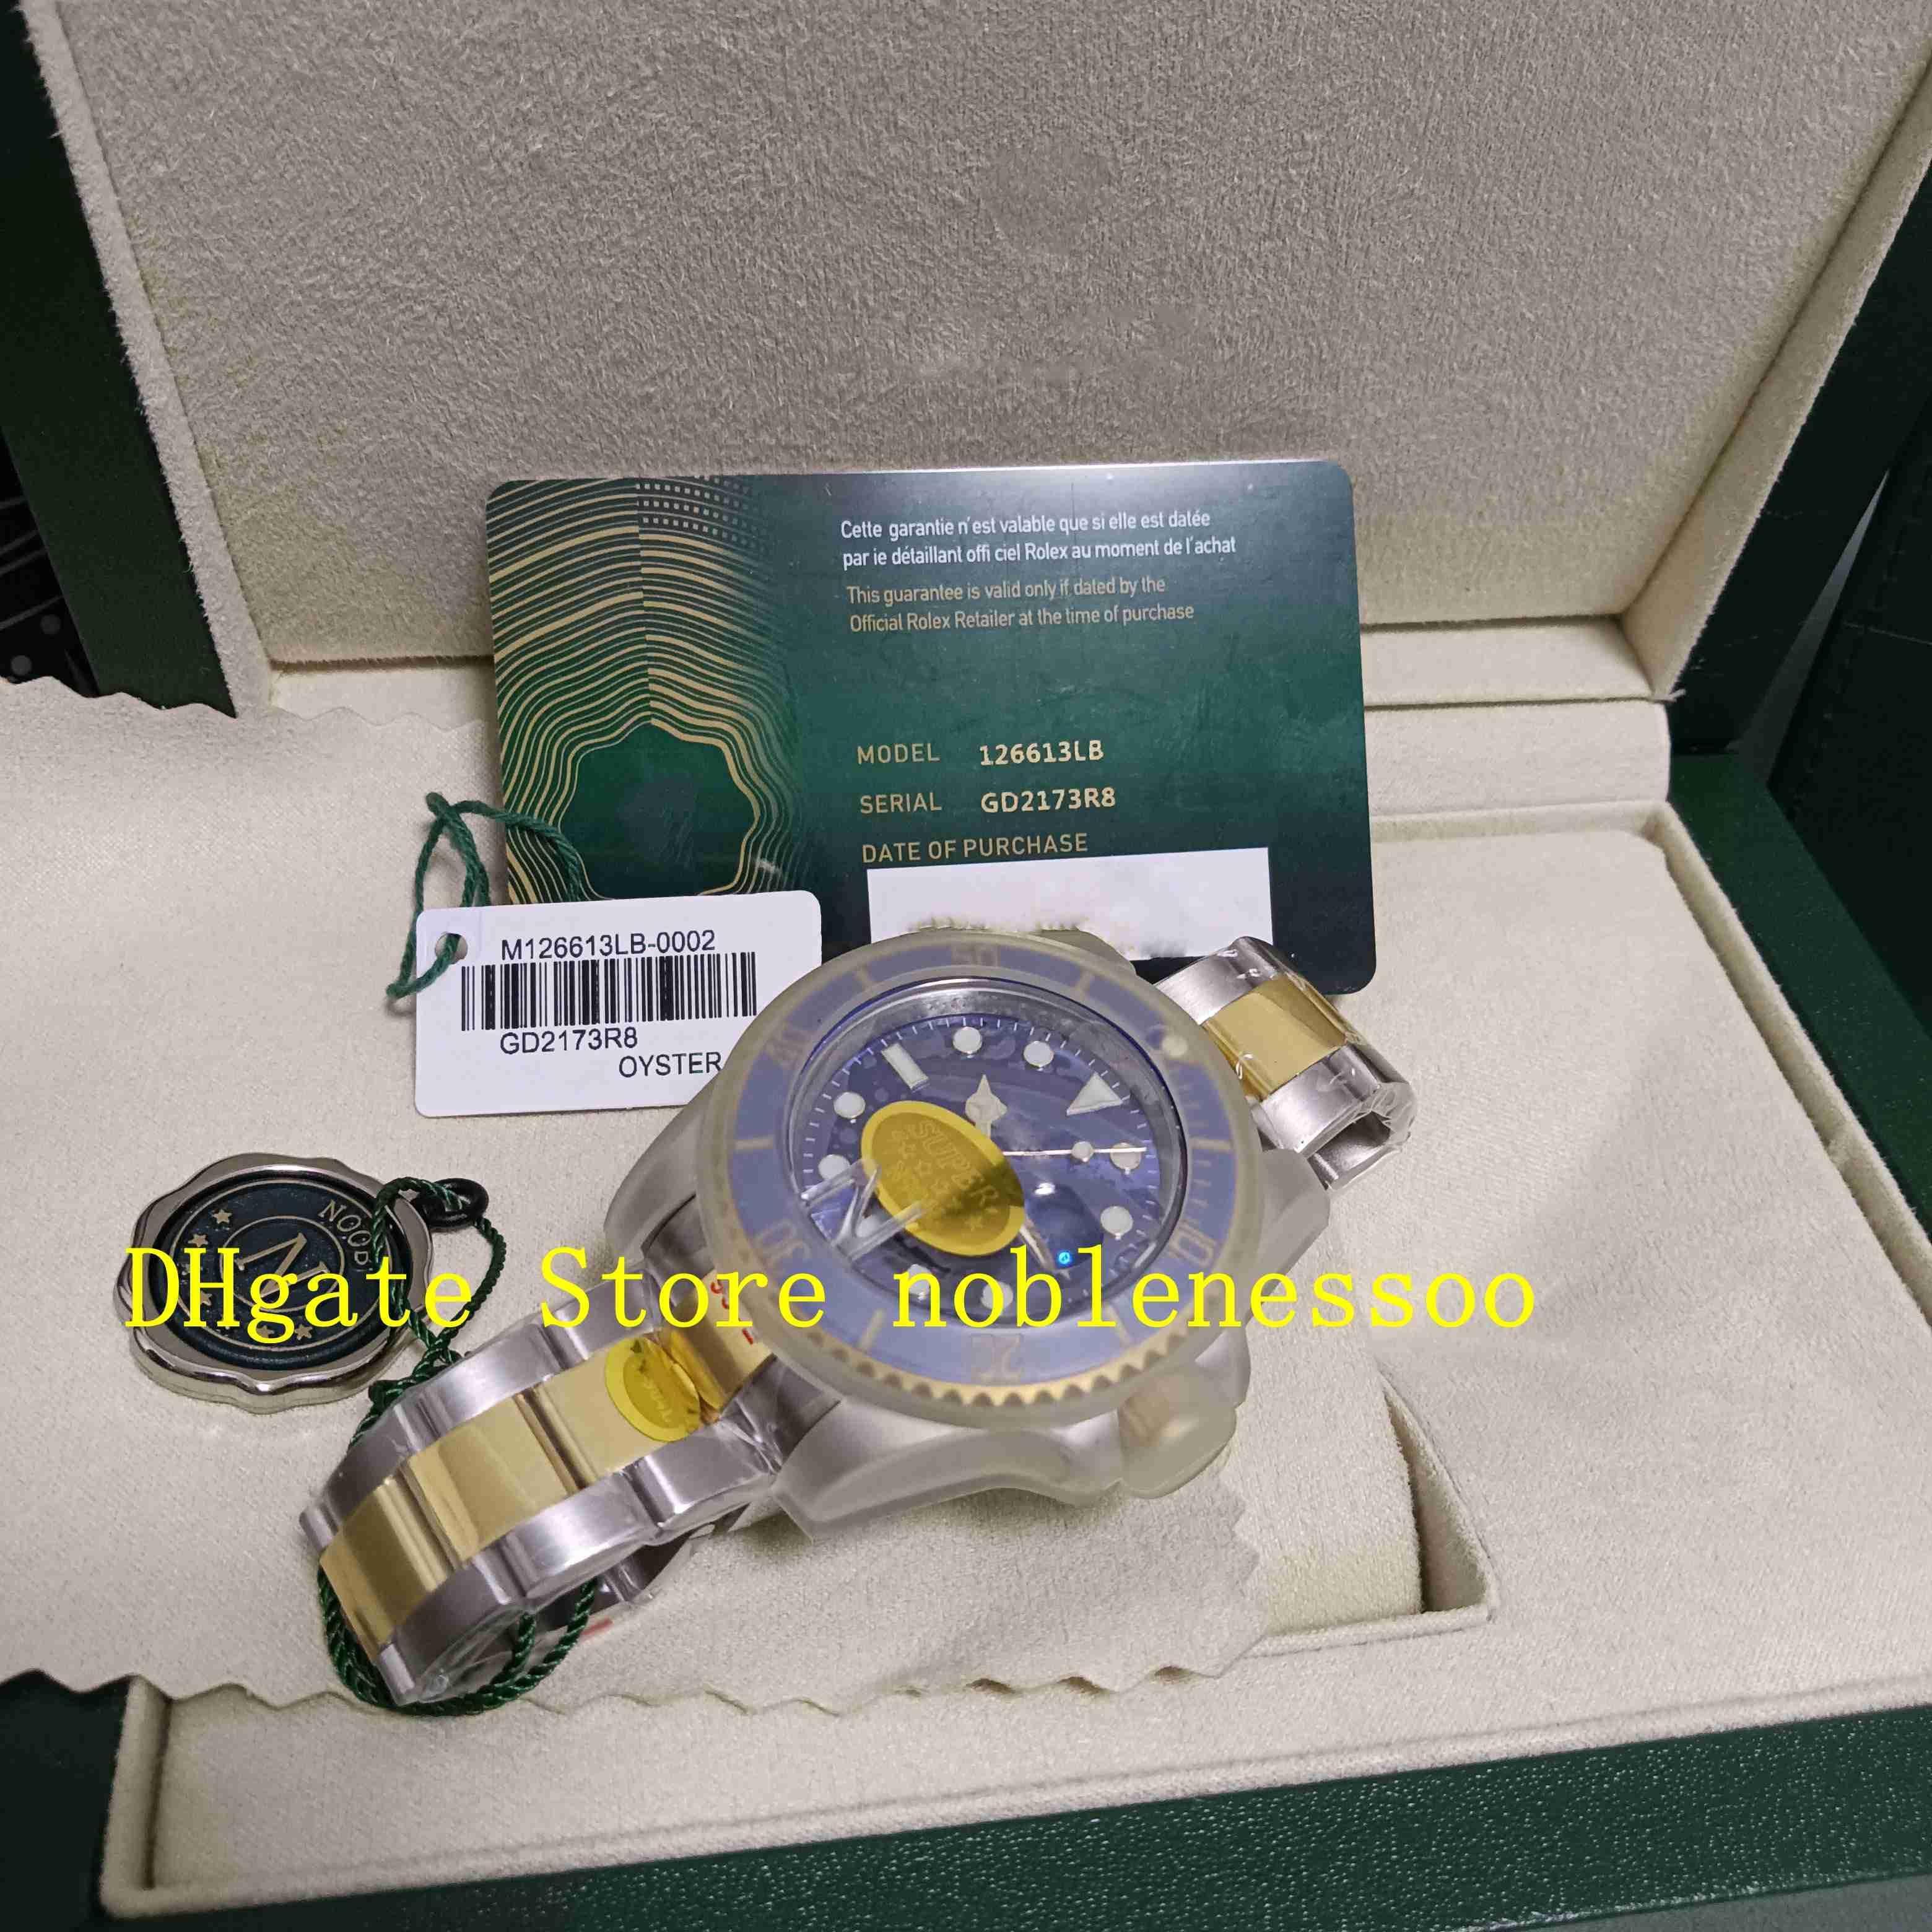 2 Color With Original Box N Factory 126613LN Watches Men's 41mm Ceramic Bezel Black Blue Dial 126613 Sapphire Glass 18k Gold 904L NoobF Eta Cal.2813 Automatic Watch